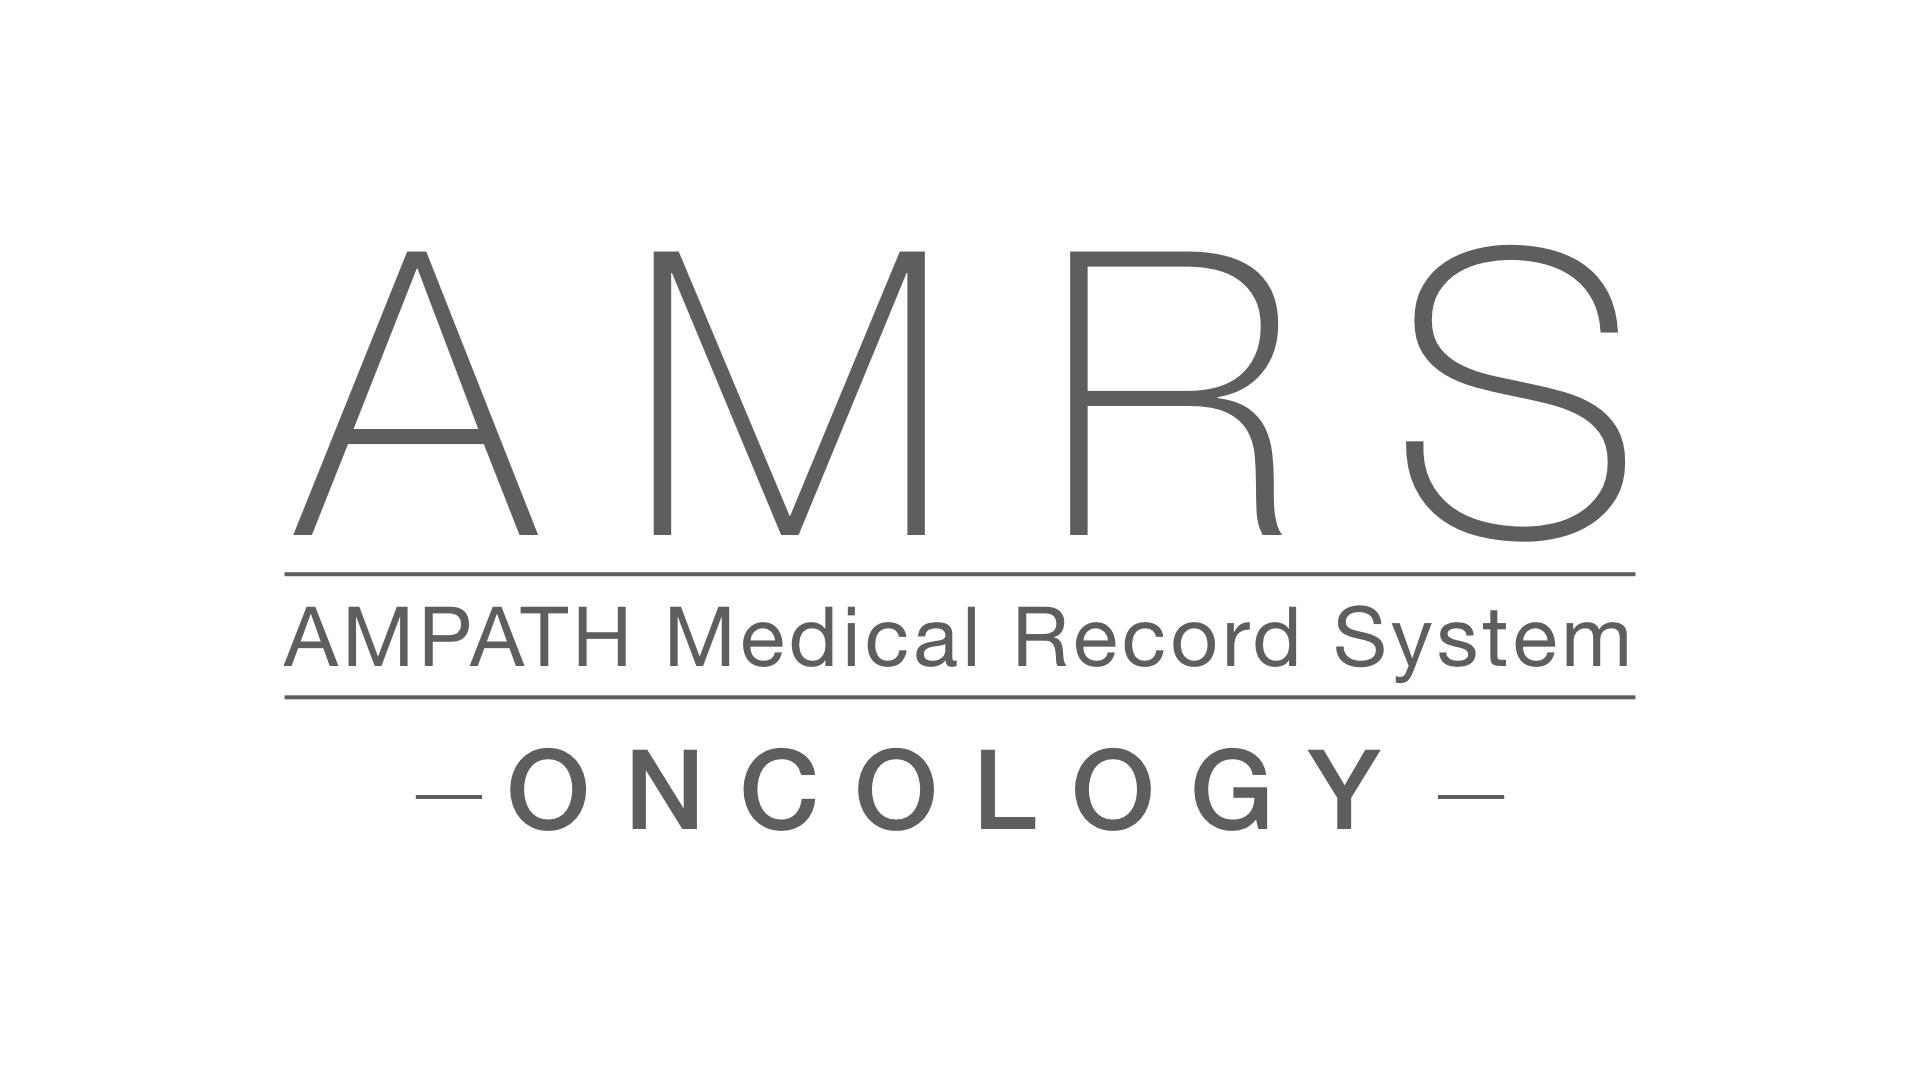 AMPATH Oncology Summit vs1.003.jpeg